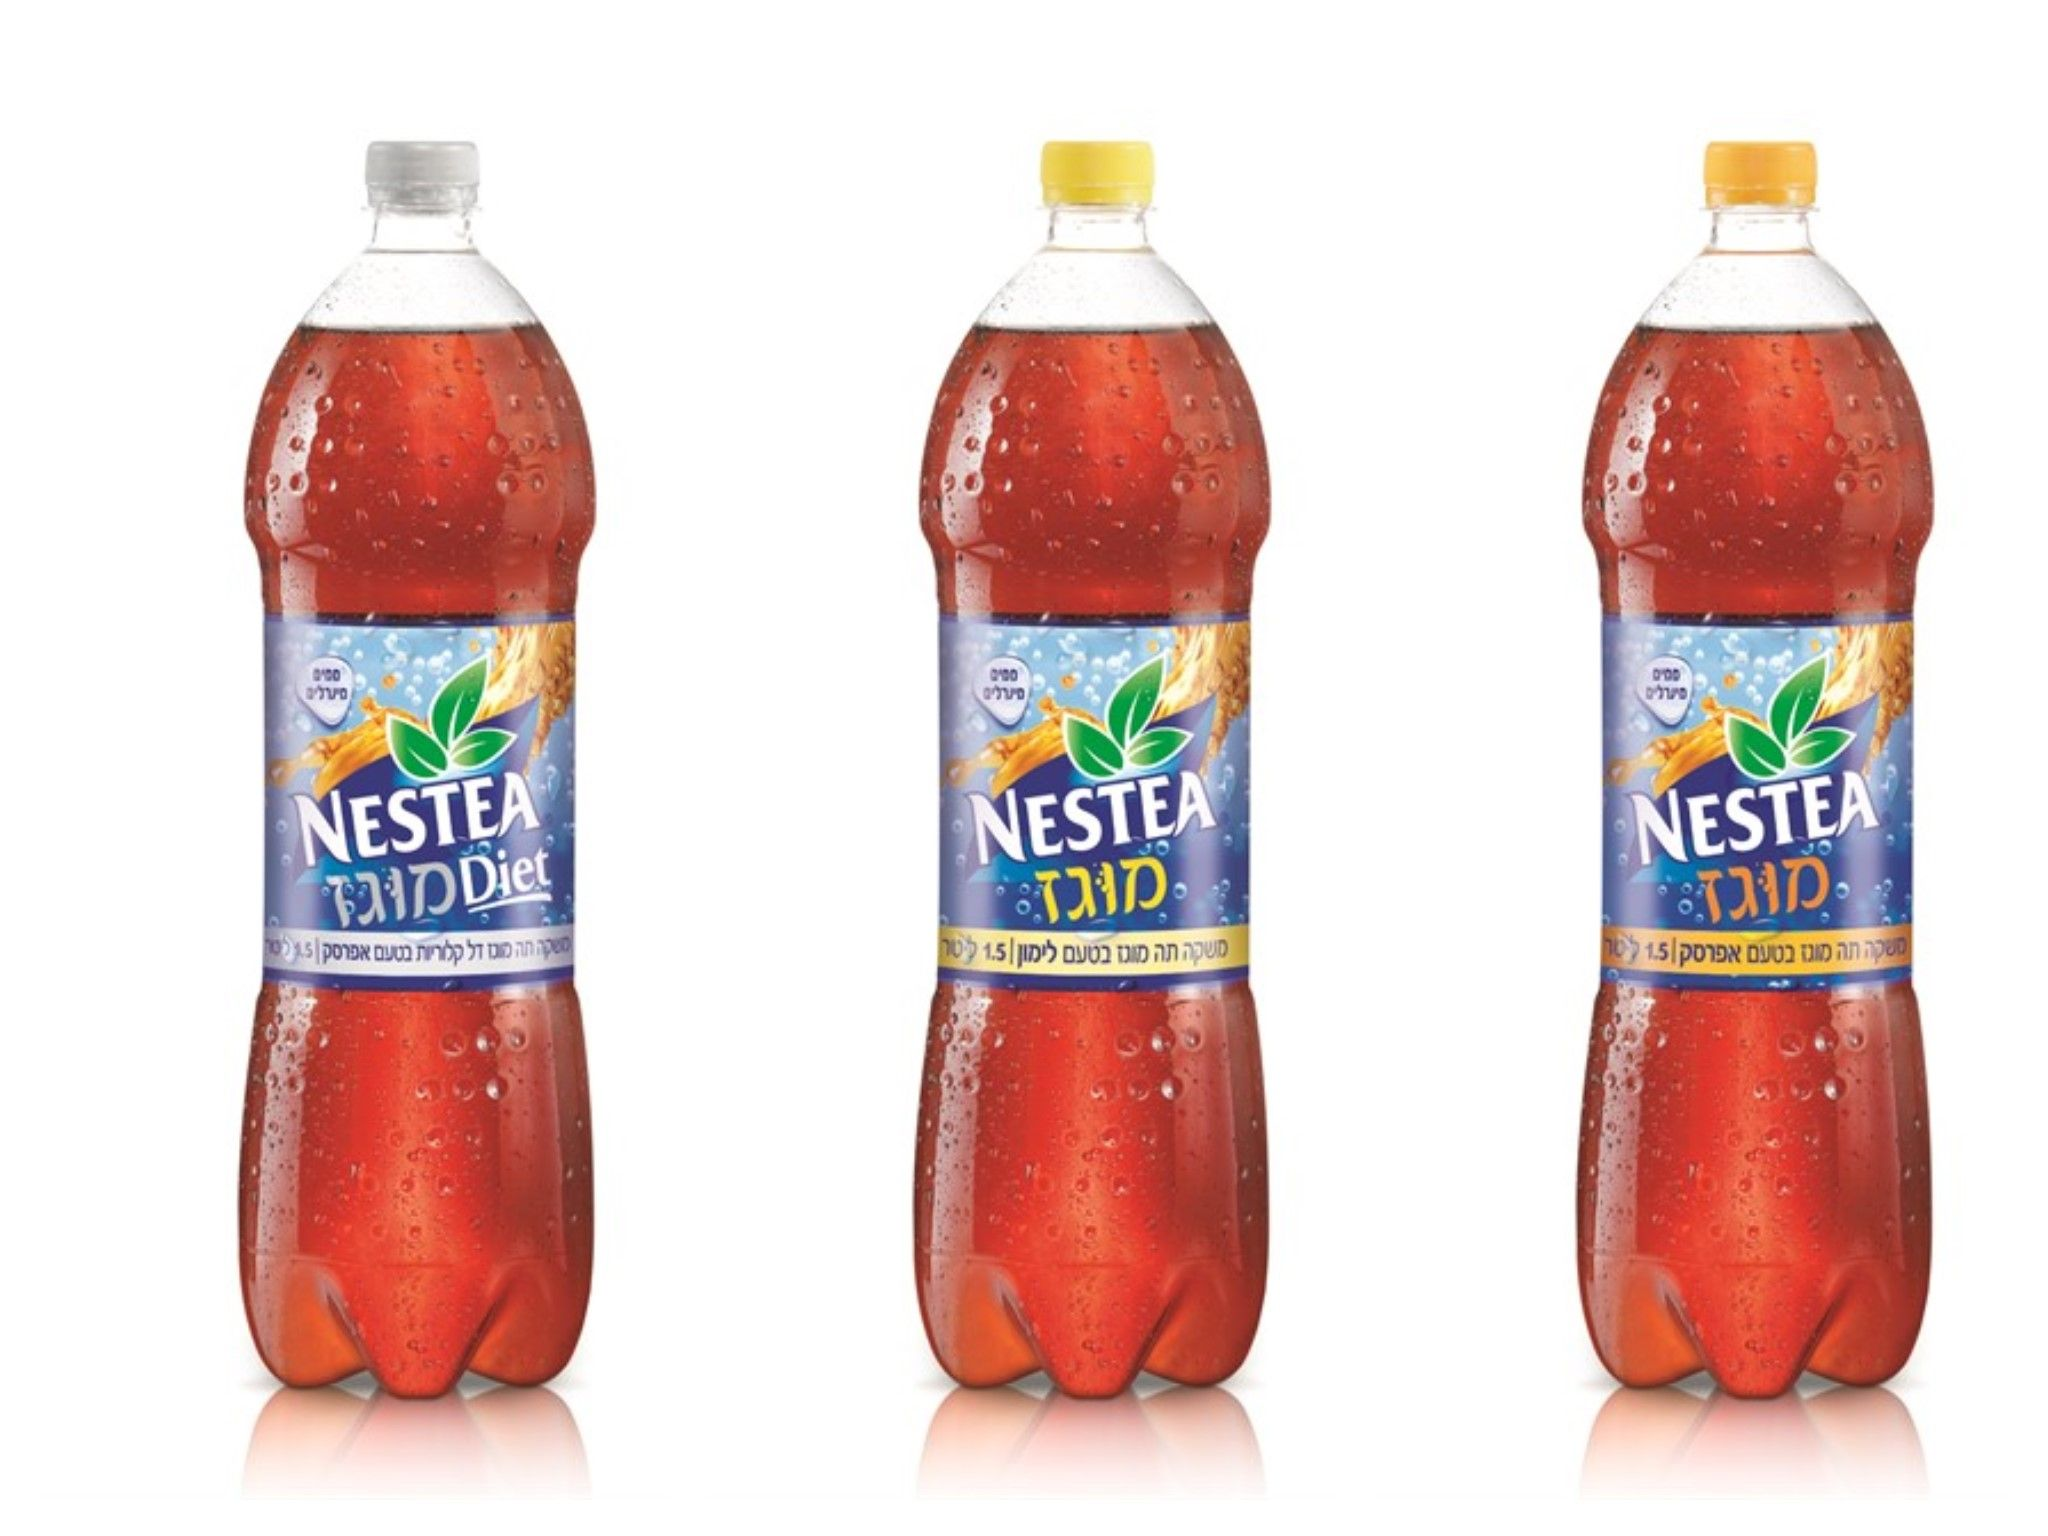 נסטי מוגז Google Search Bottle design, Bottle, Tea